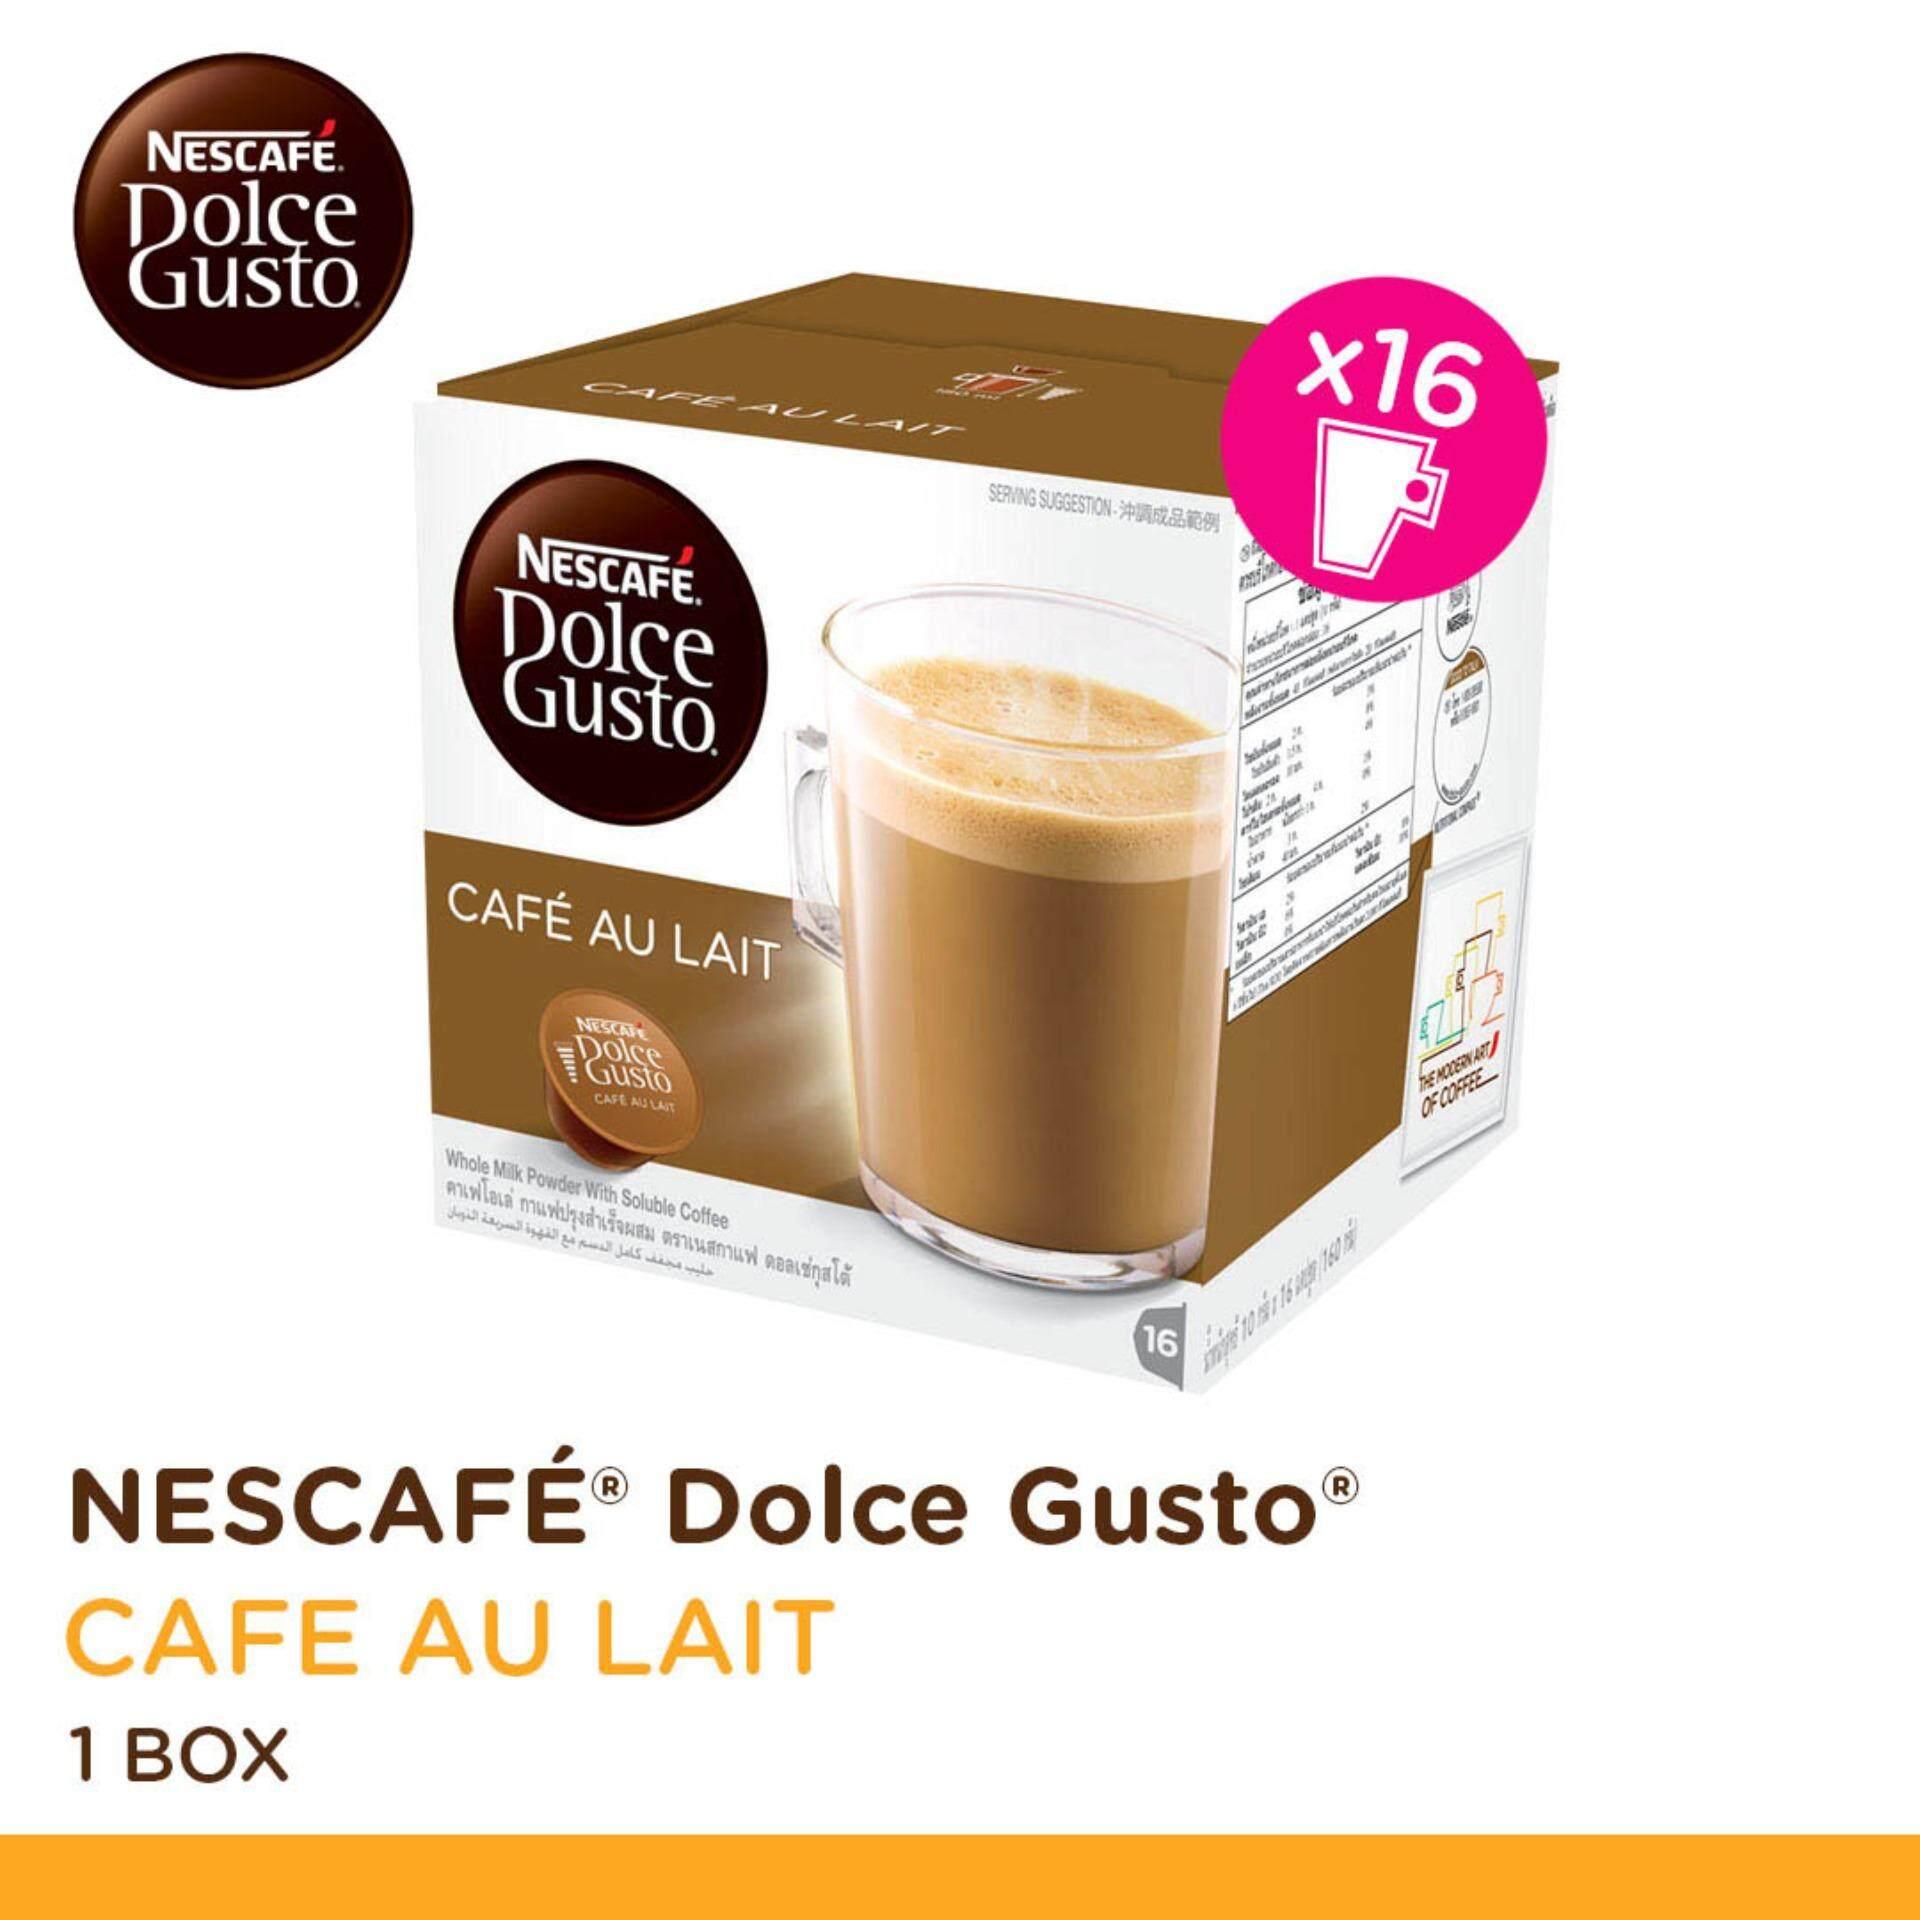 NESCAFE Dolce Gusto Cafe au Lait Coffee 16 Capsules Per Box